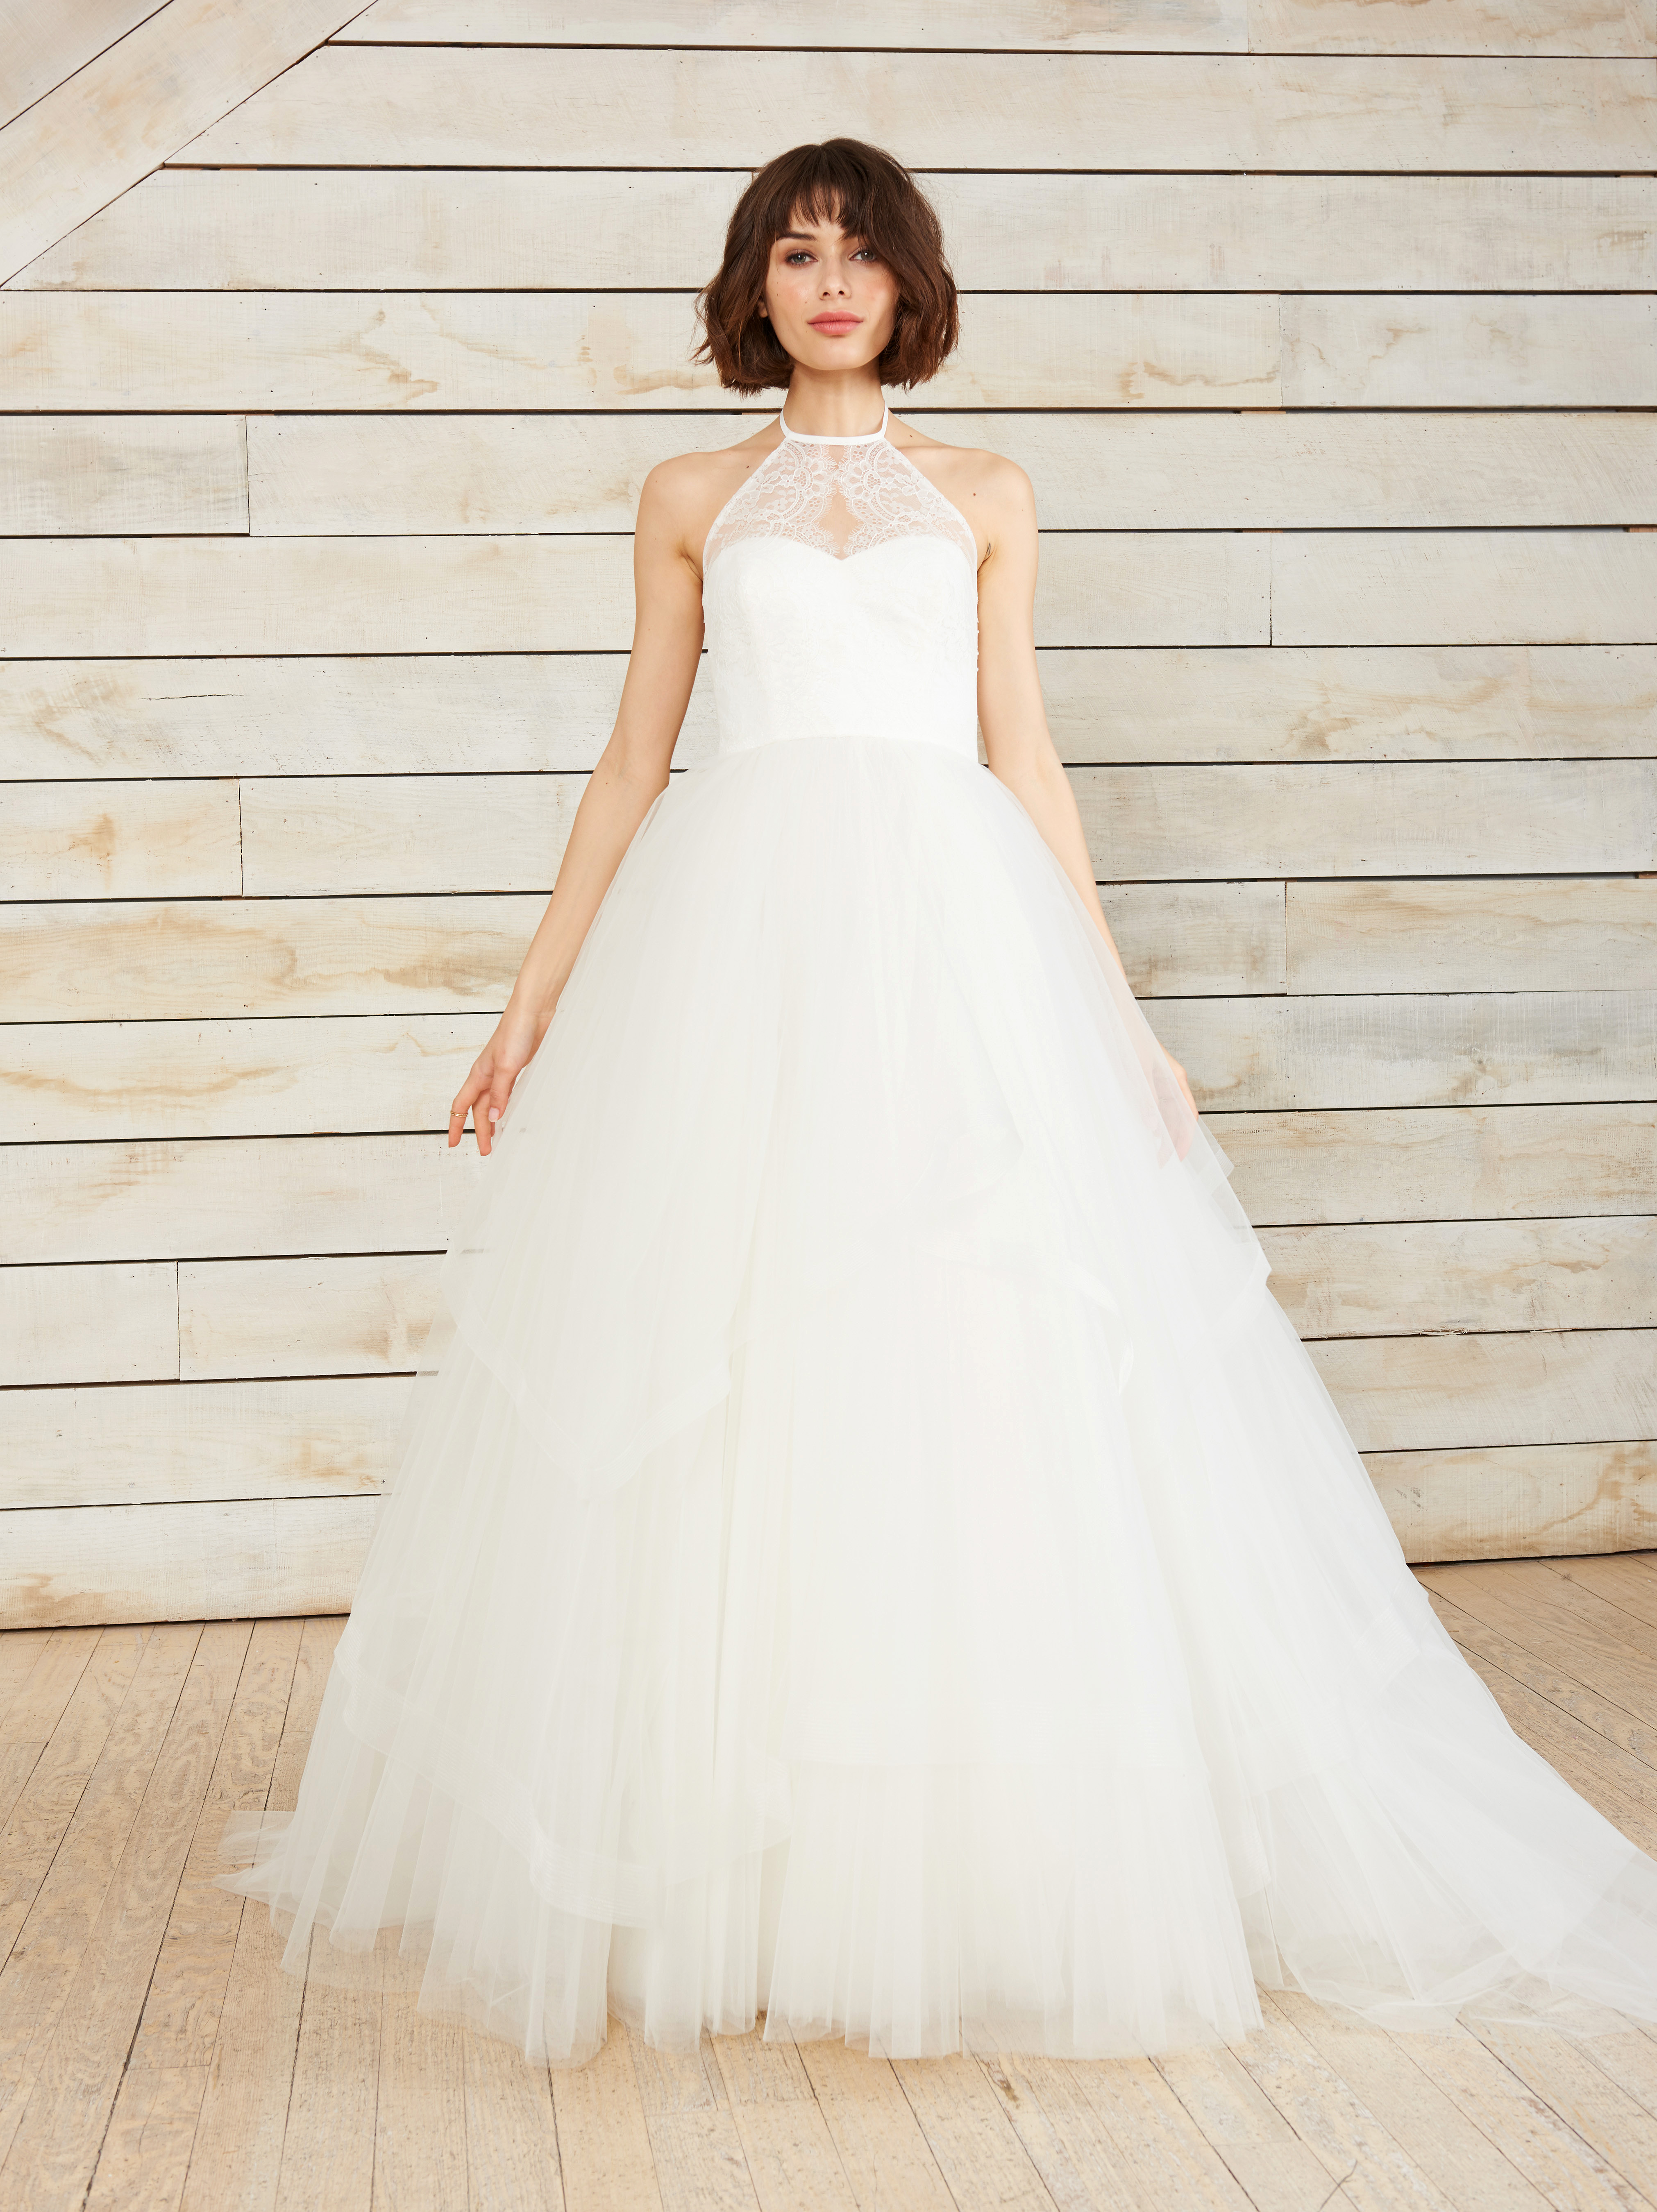 nouvelle amsale halter tulle ball gown wedding dress spring 2018